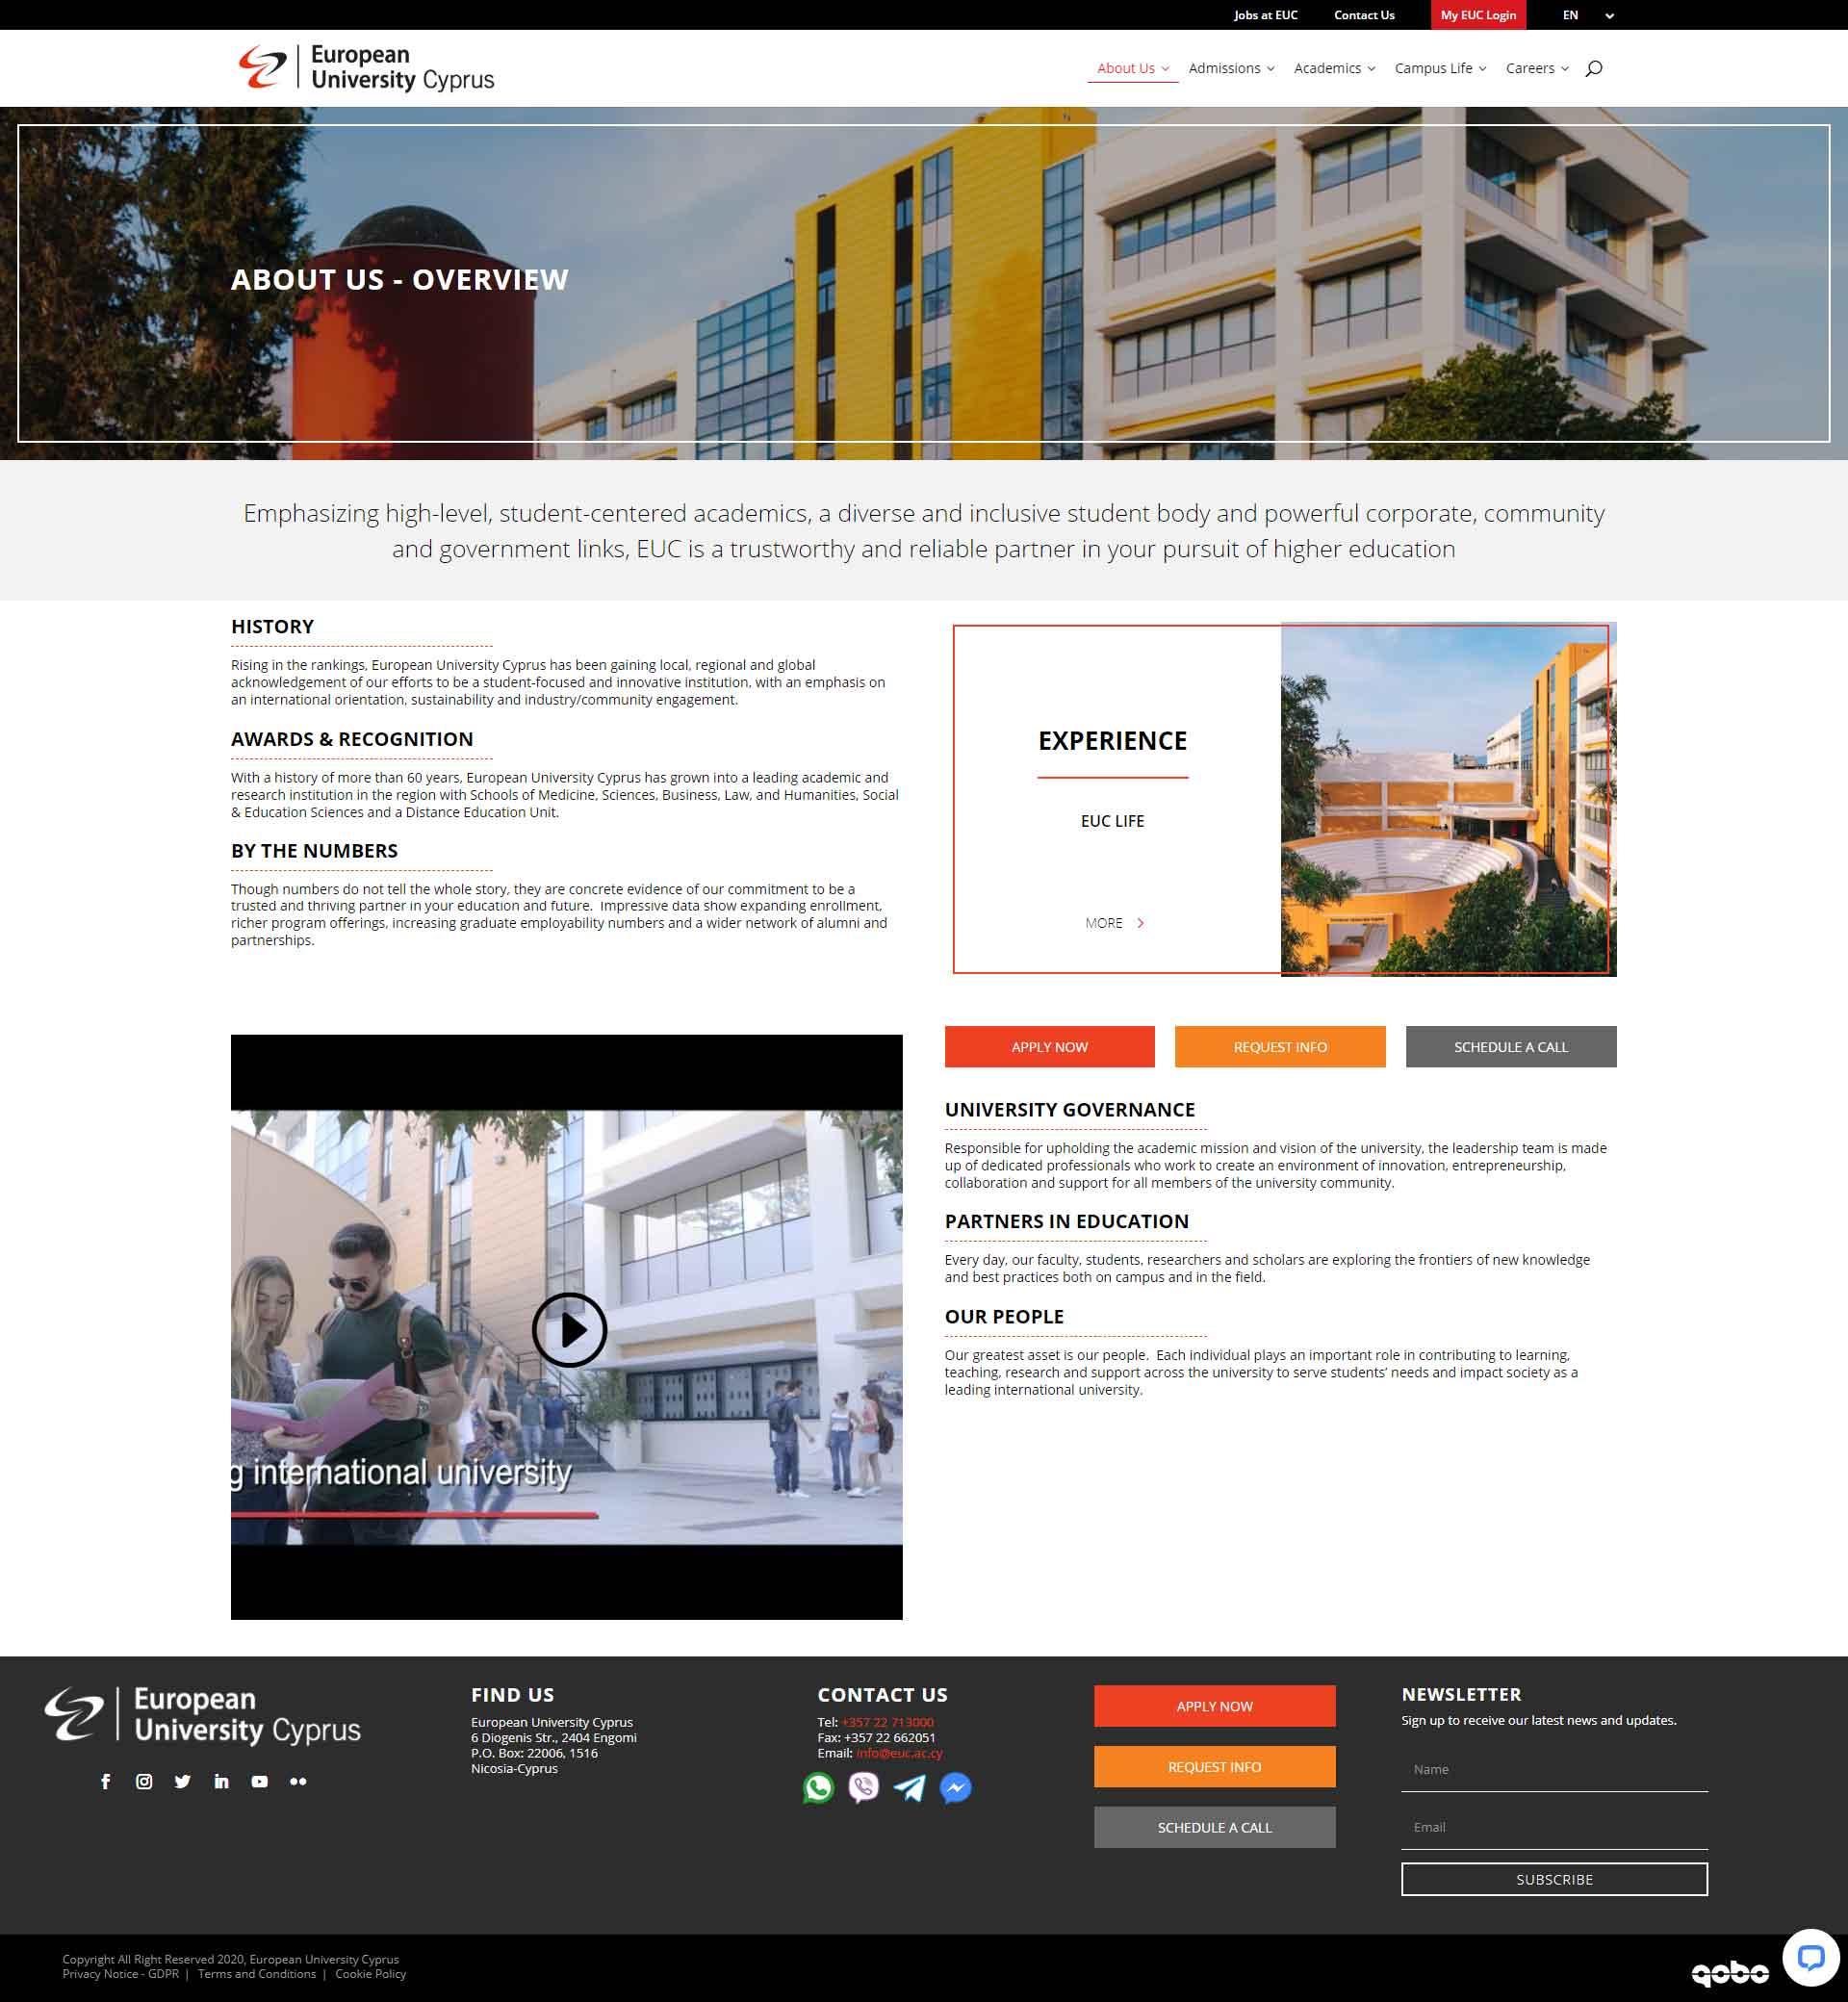 European University Cyprus Website with effortless navigation and CTAs